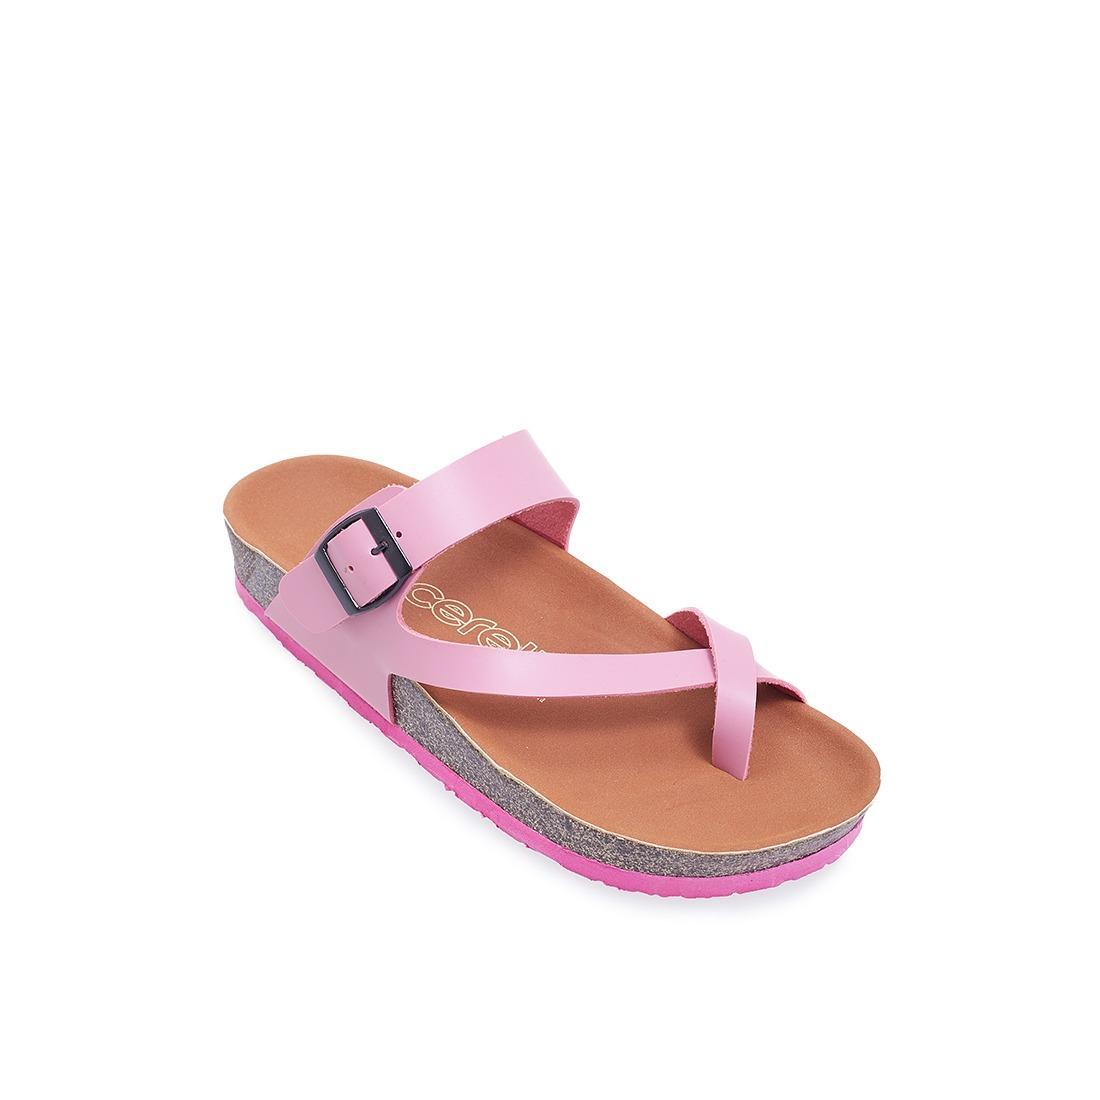 Cerelia Visca Sandal Pink